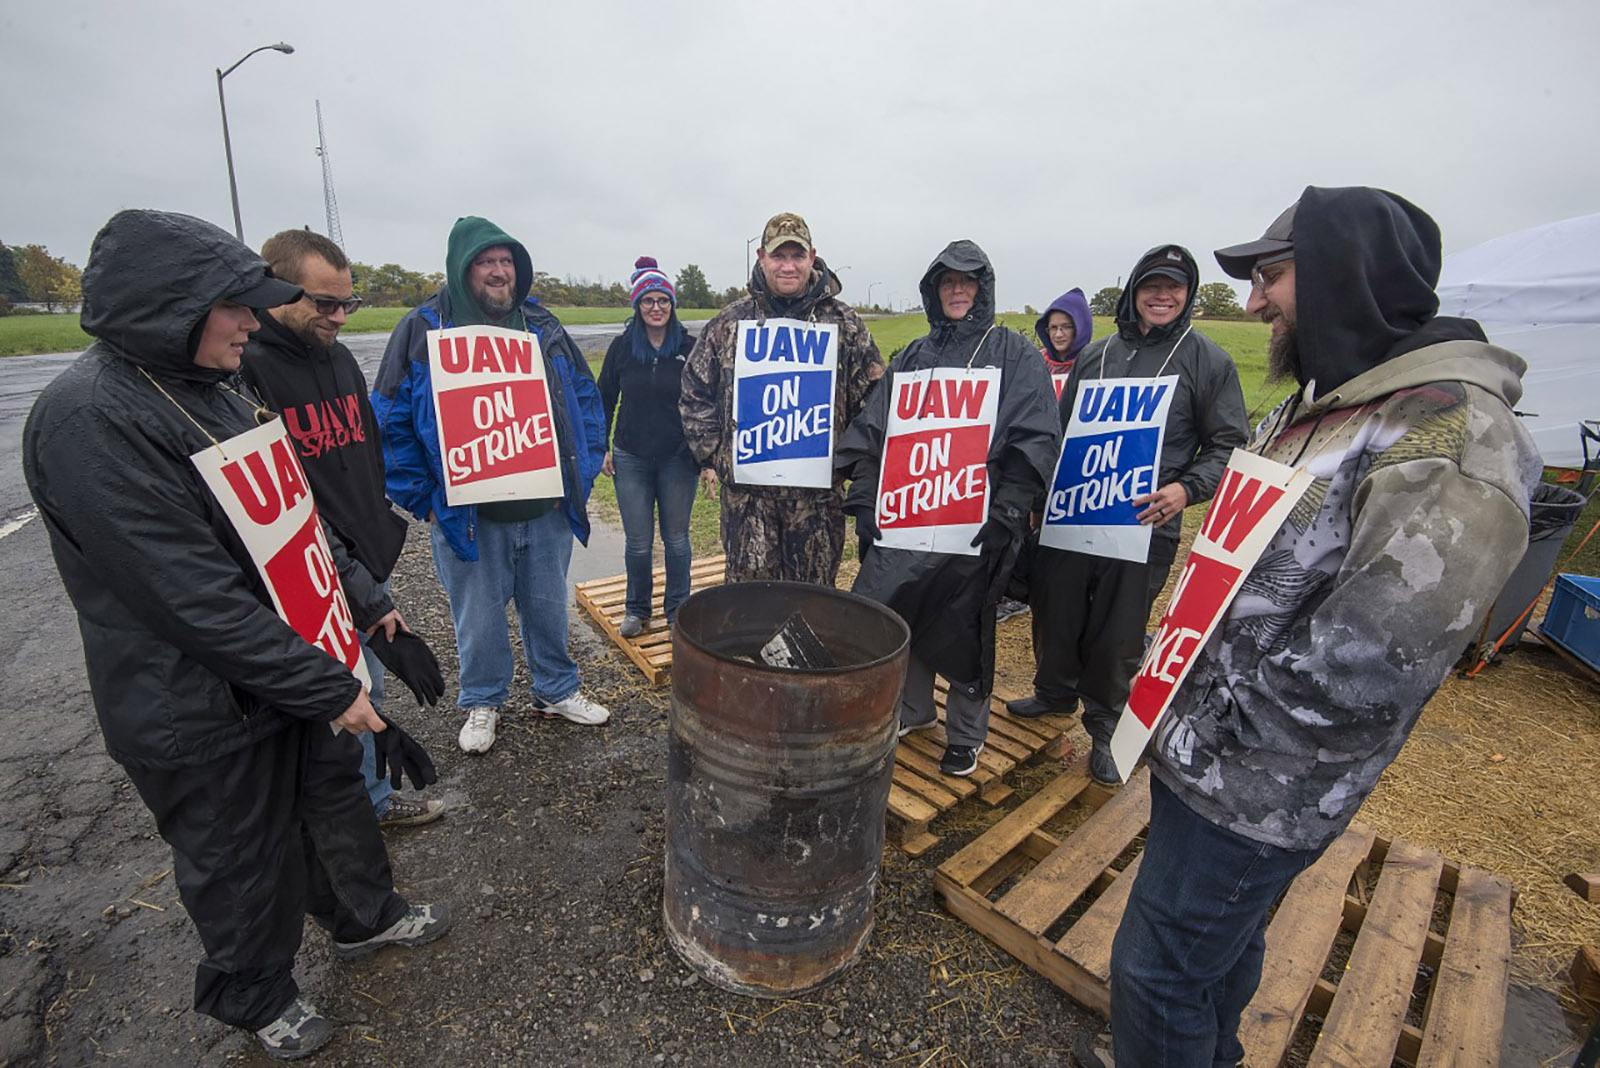 Striking workers picketing Lockport's GM plant